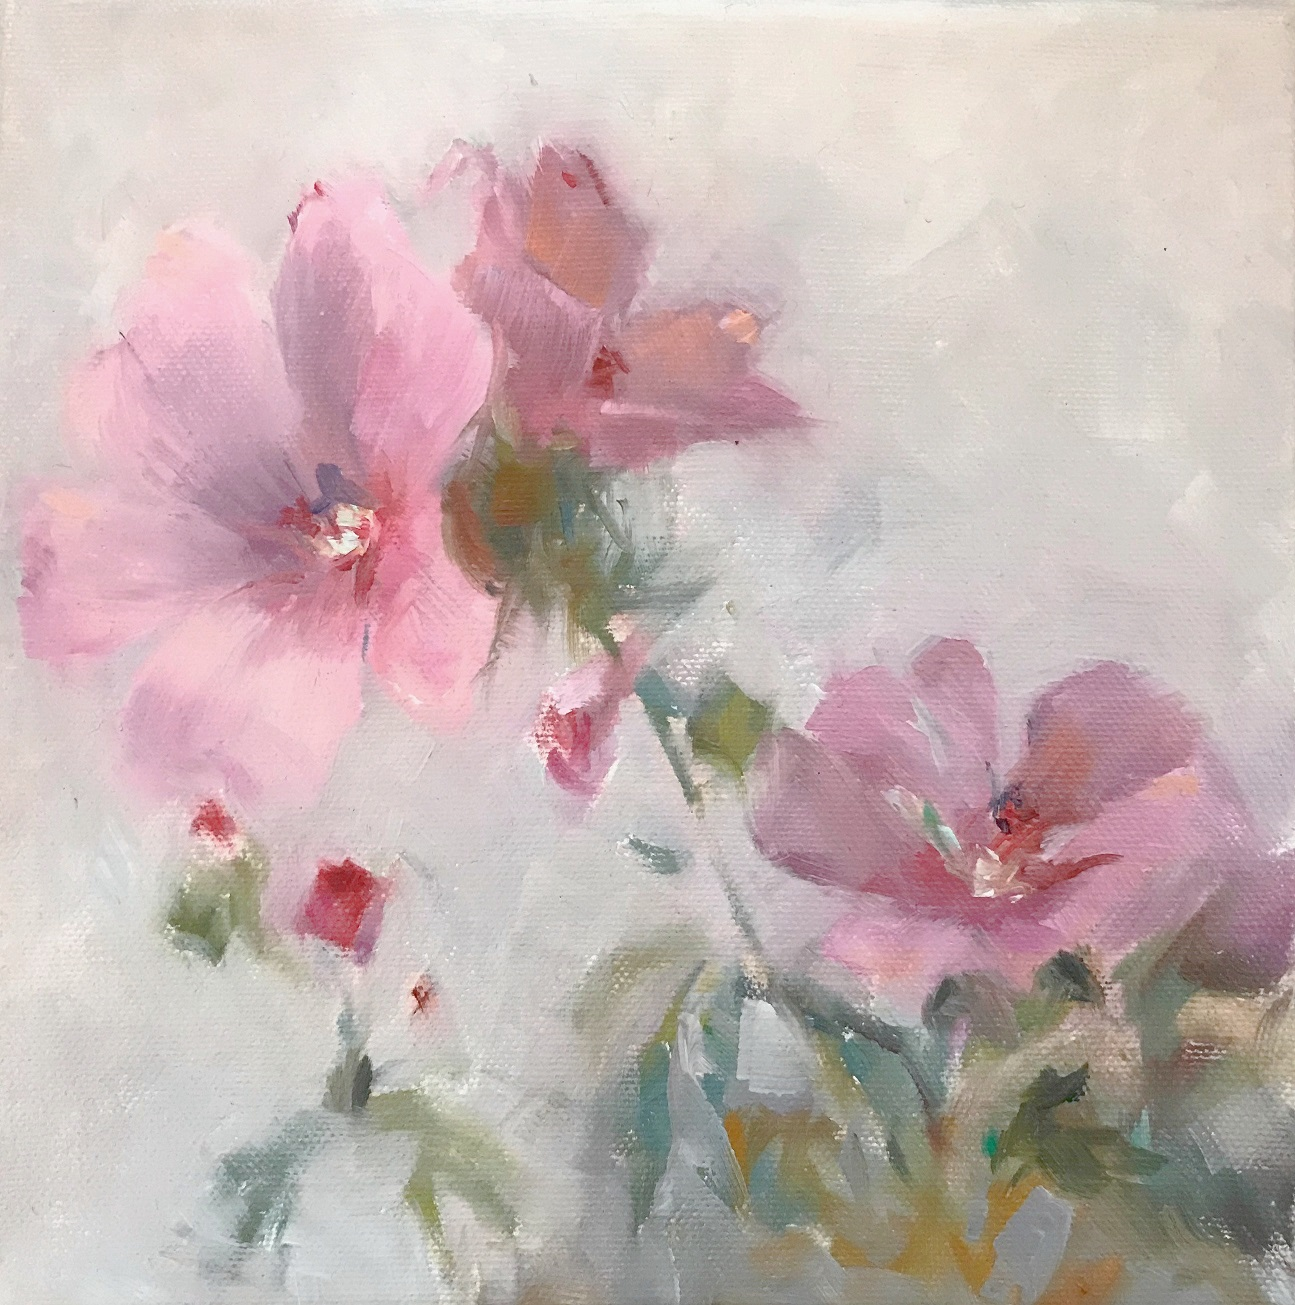 Rose Mallow, 350€, 20x20 cm